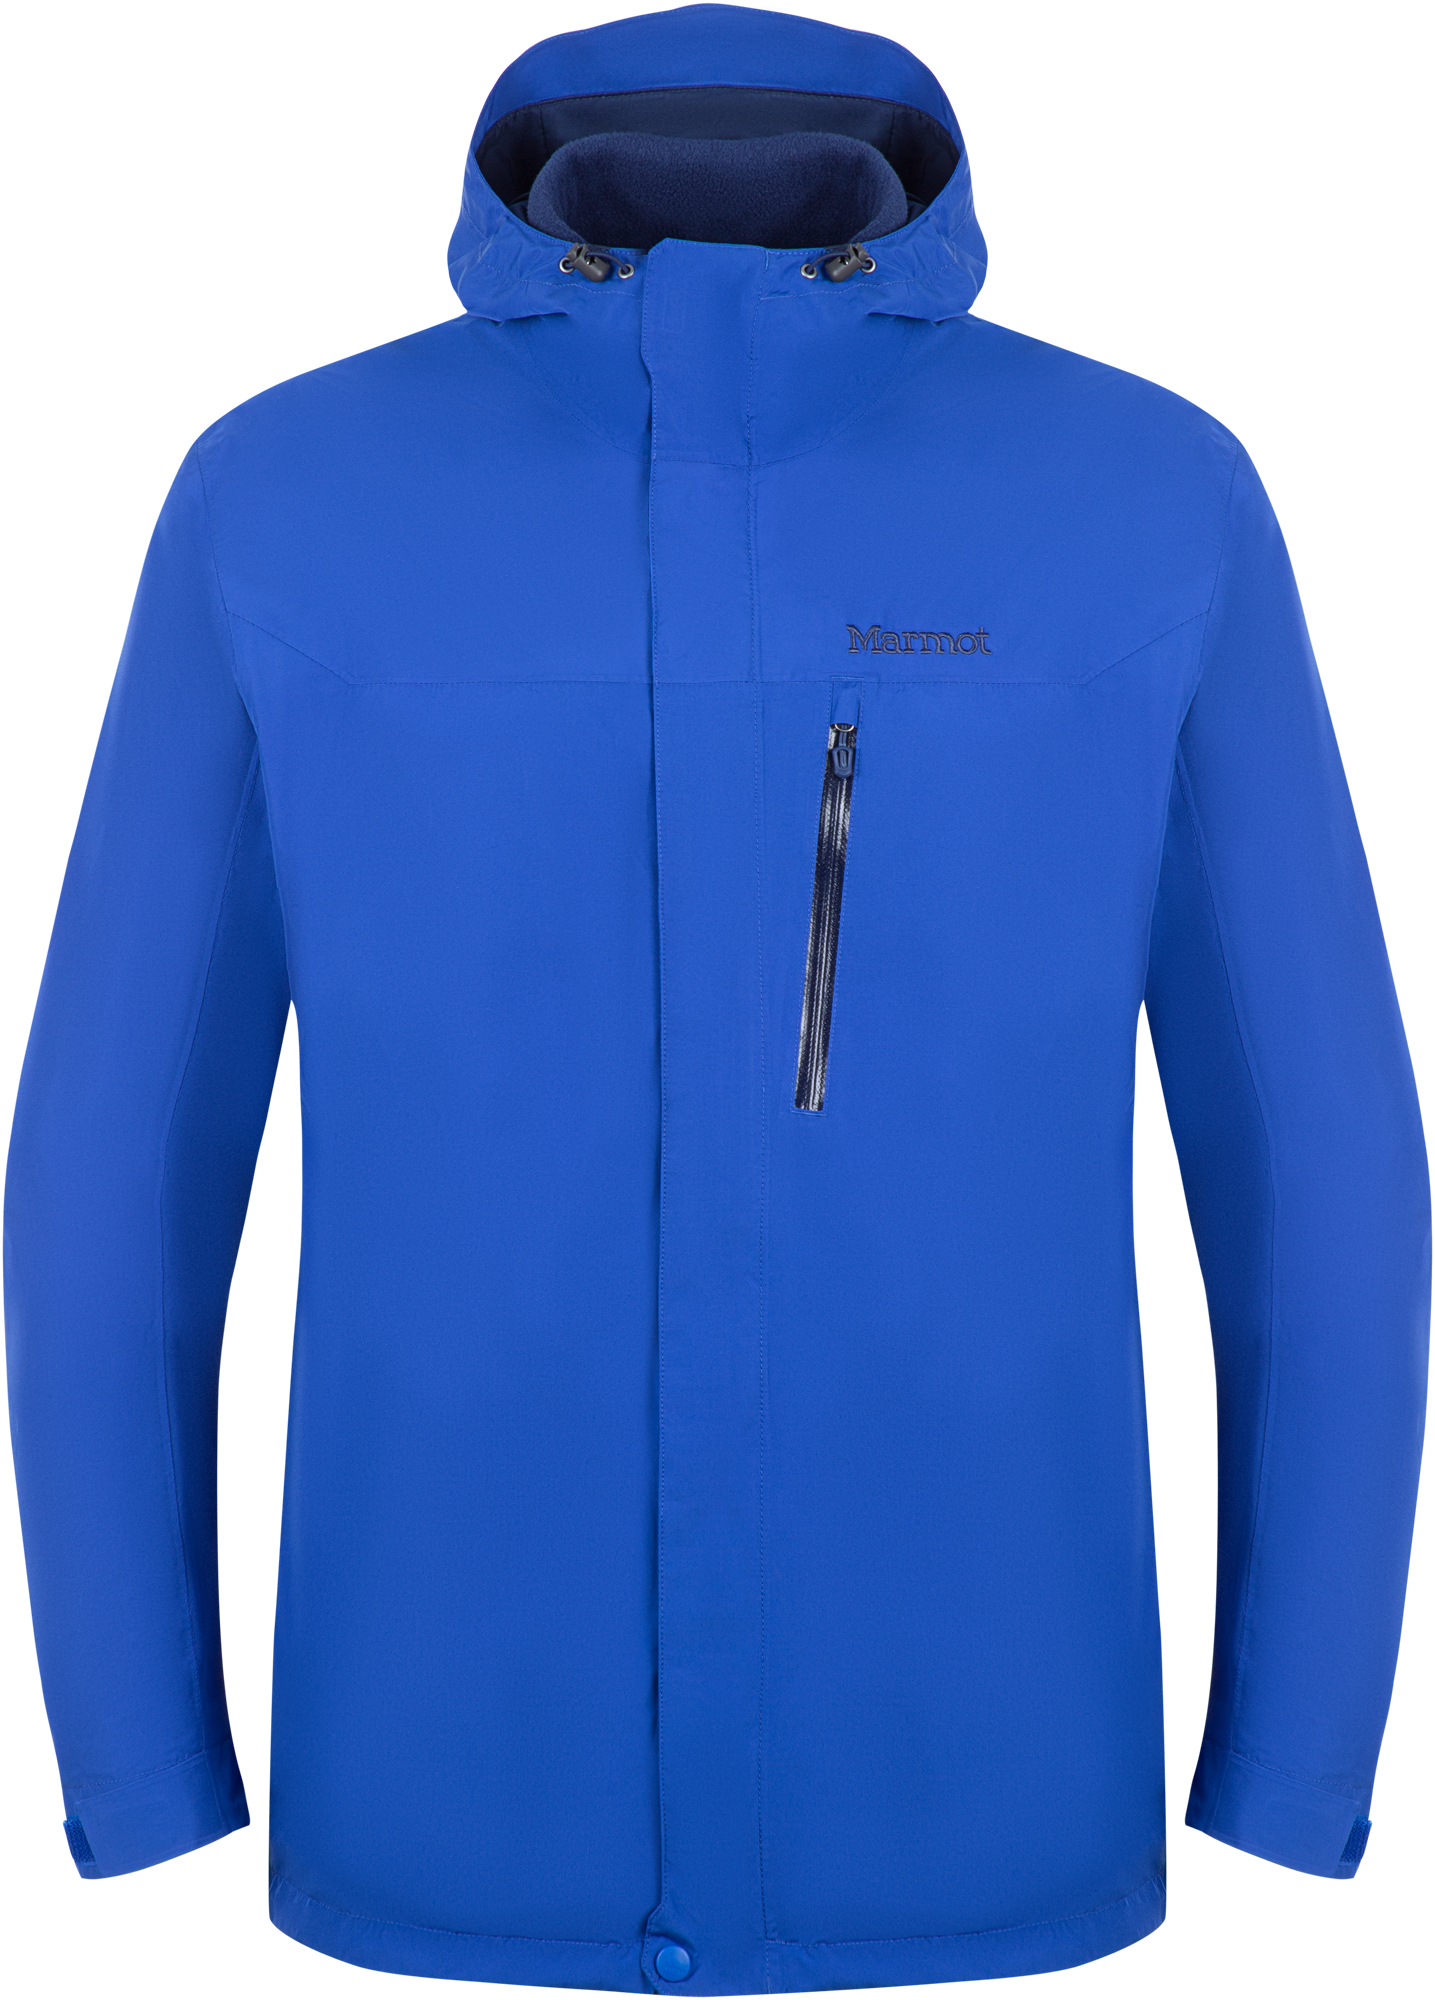 Marmot Куртка 3 в 1 мужская Ramble Component, размер 58-60